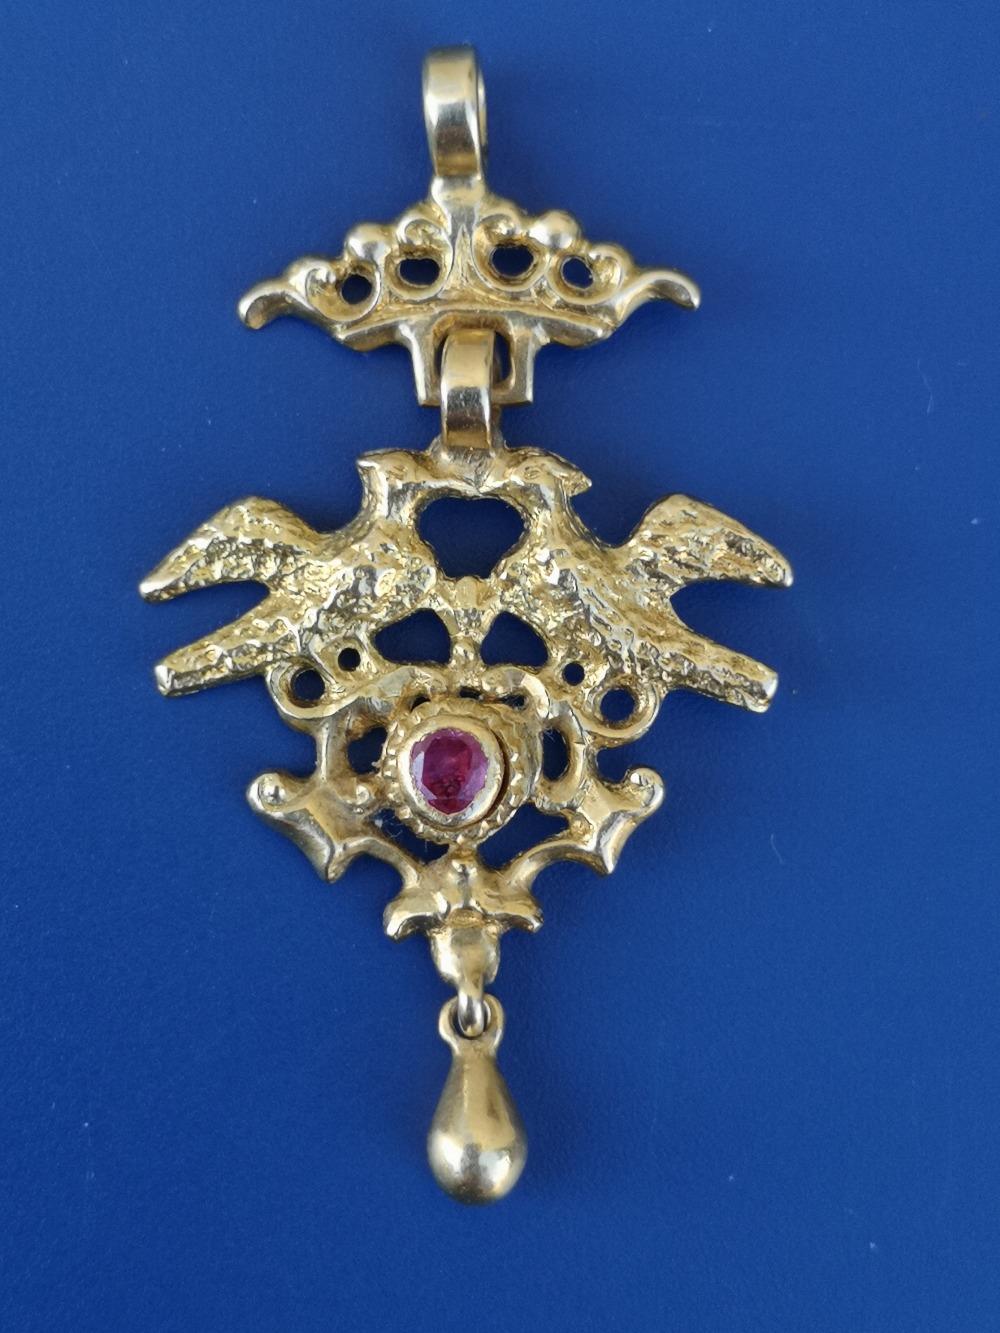 A small 19thC gold pendant in the Renaissance Revival taste, an openwork coronet having an open cast